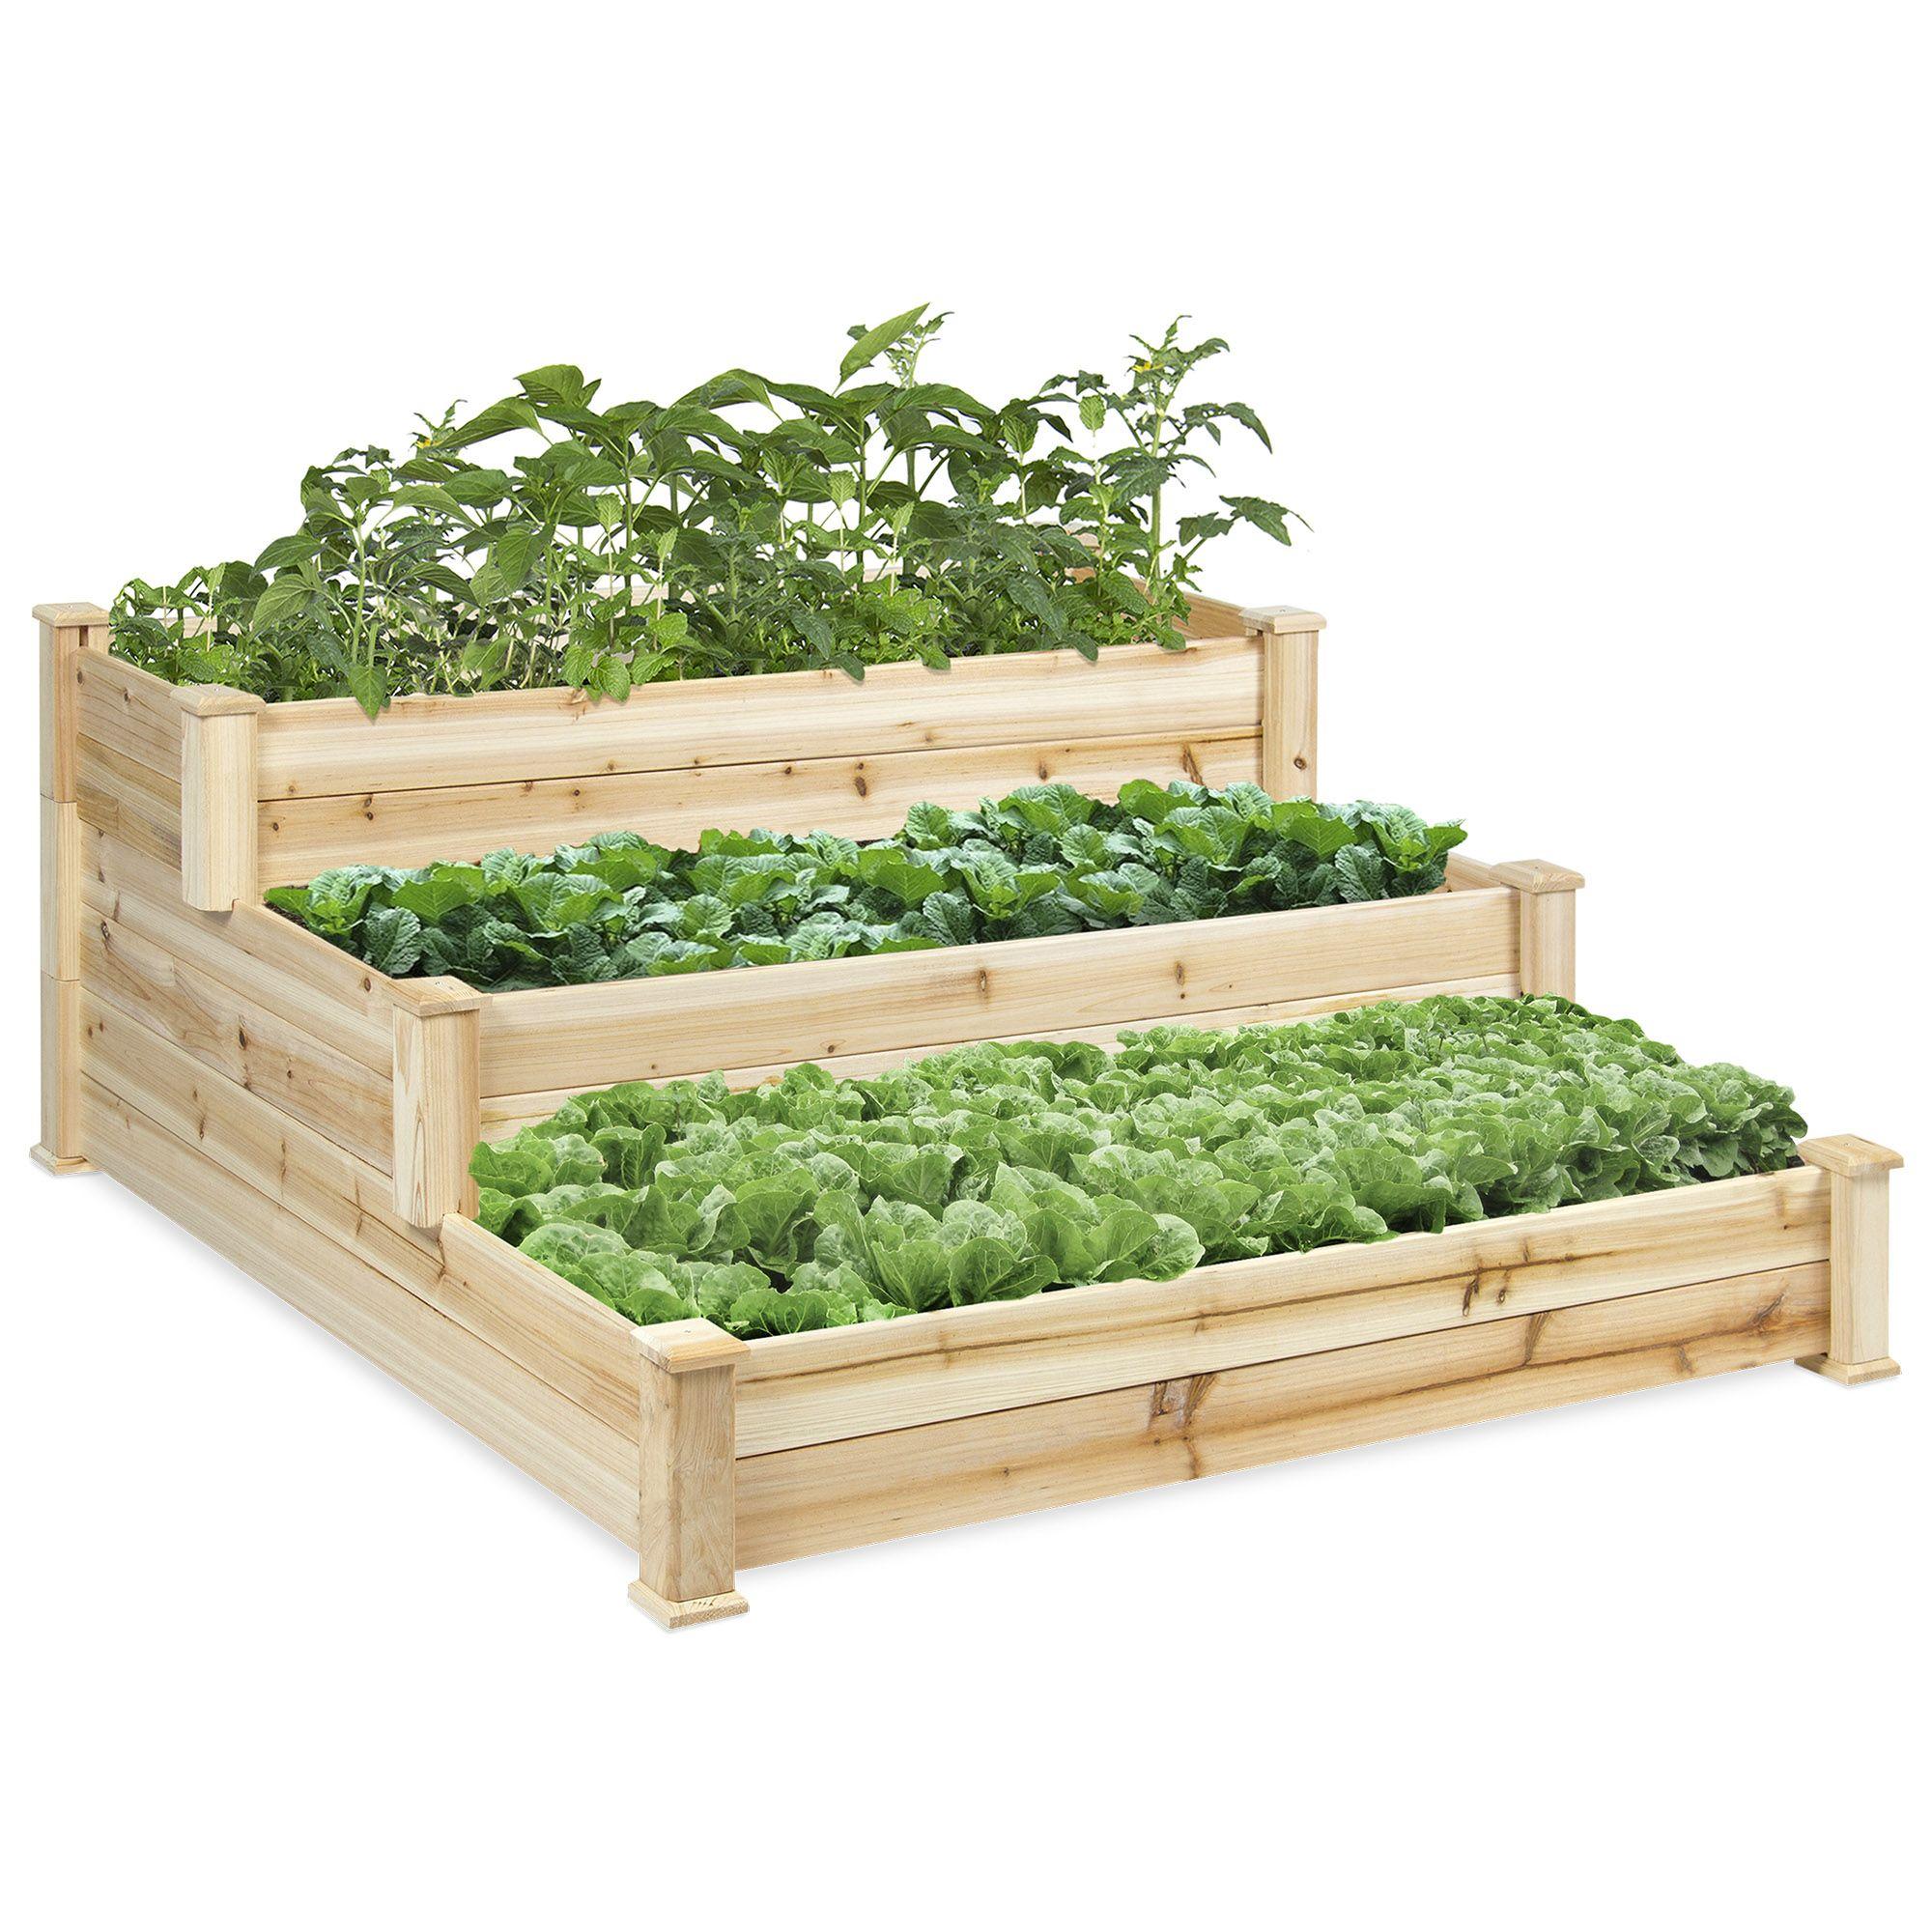 Patio Garden Home Vegetable Garden Wooden Raised Garden Bed